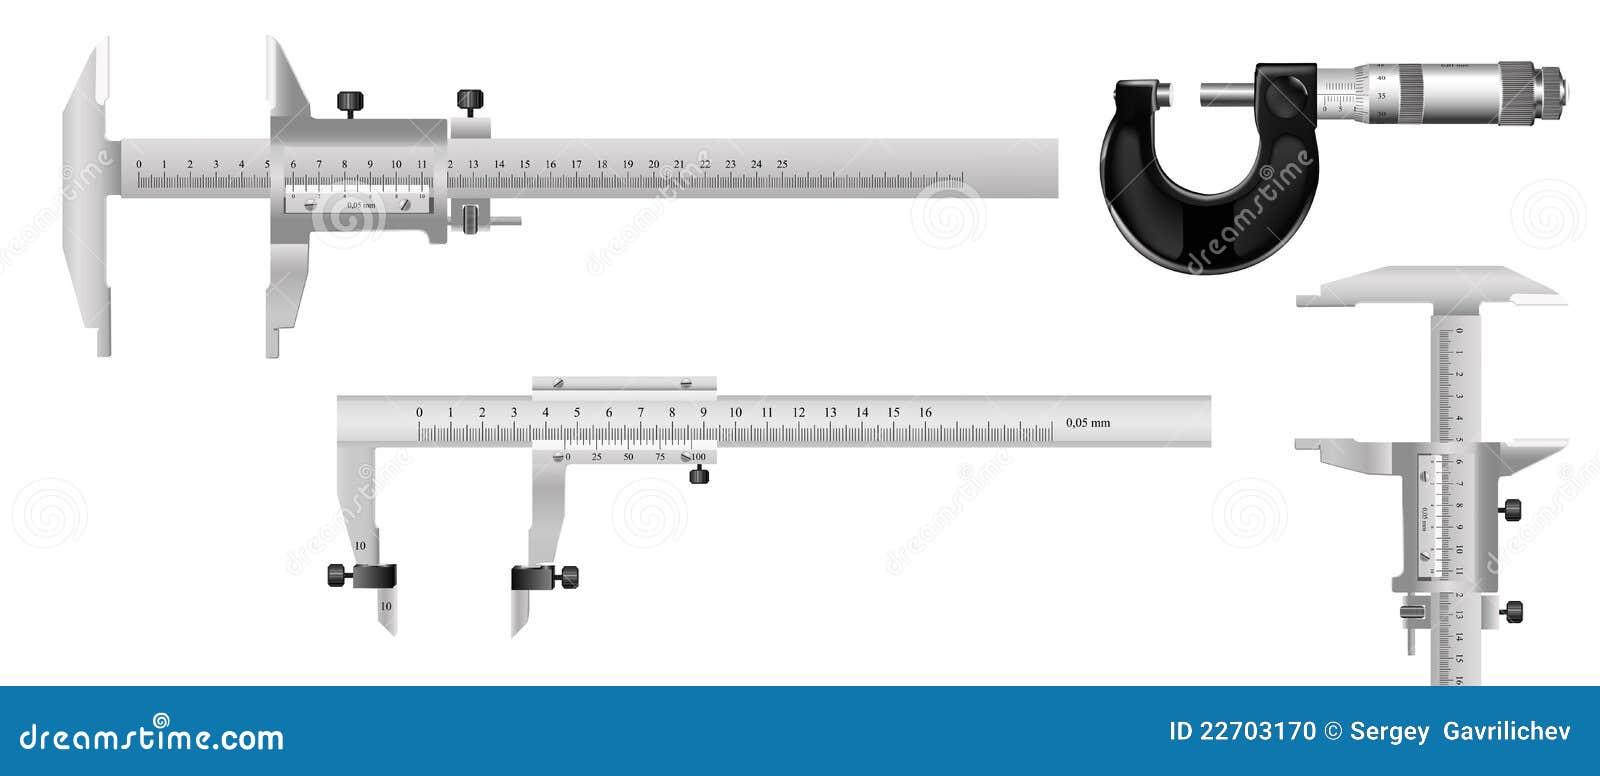 Measurement Technology MTL 766ac Shunt-Diode Safety Barrier MTL766ac